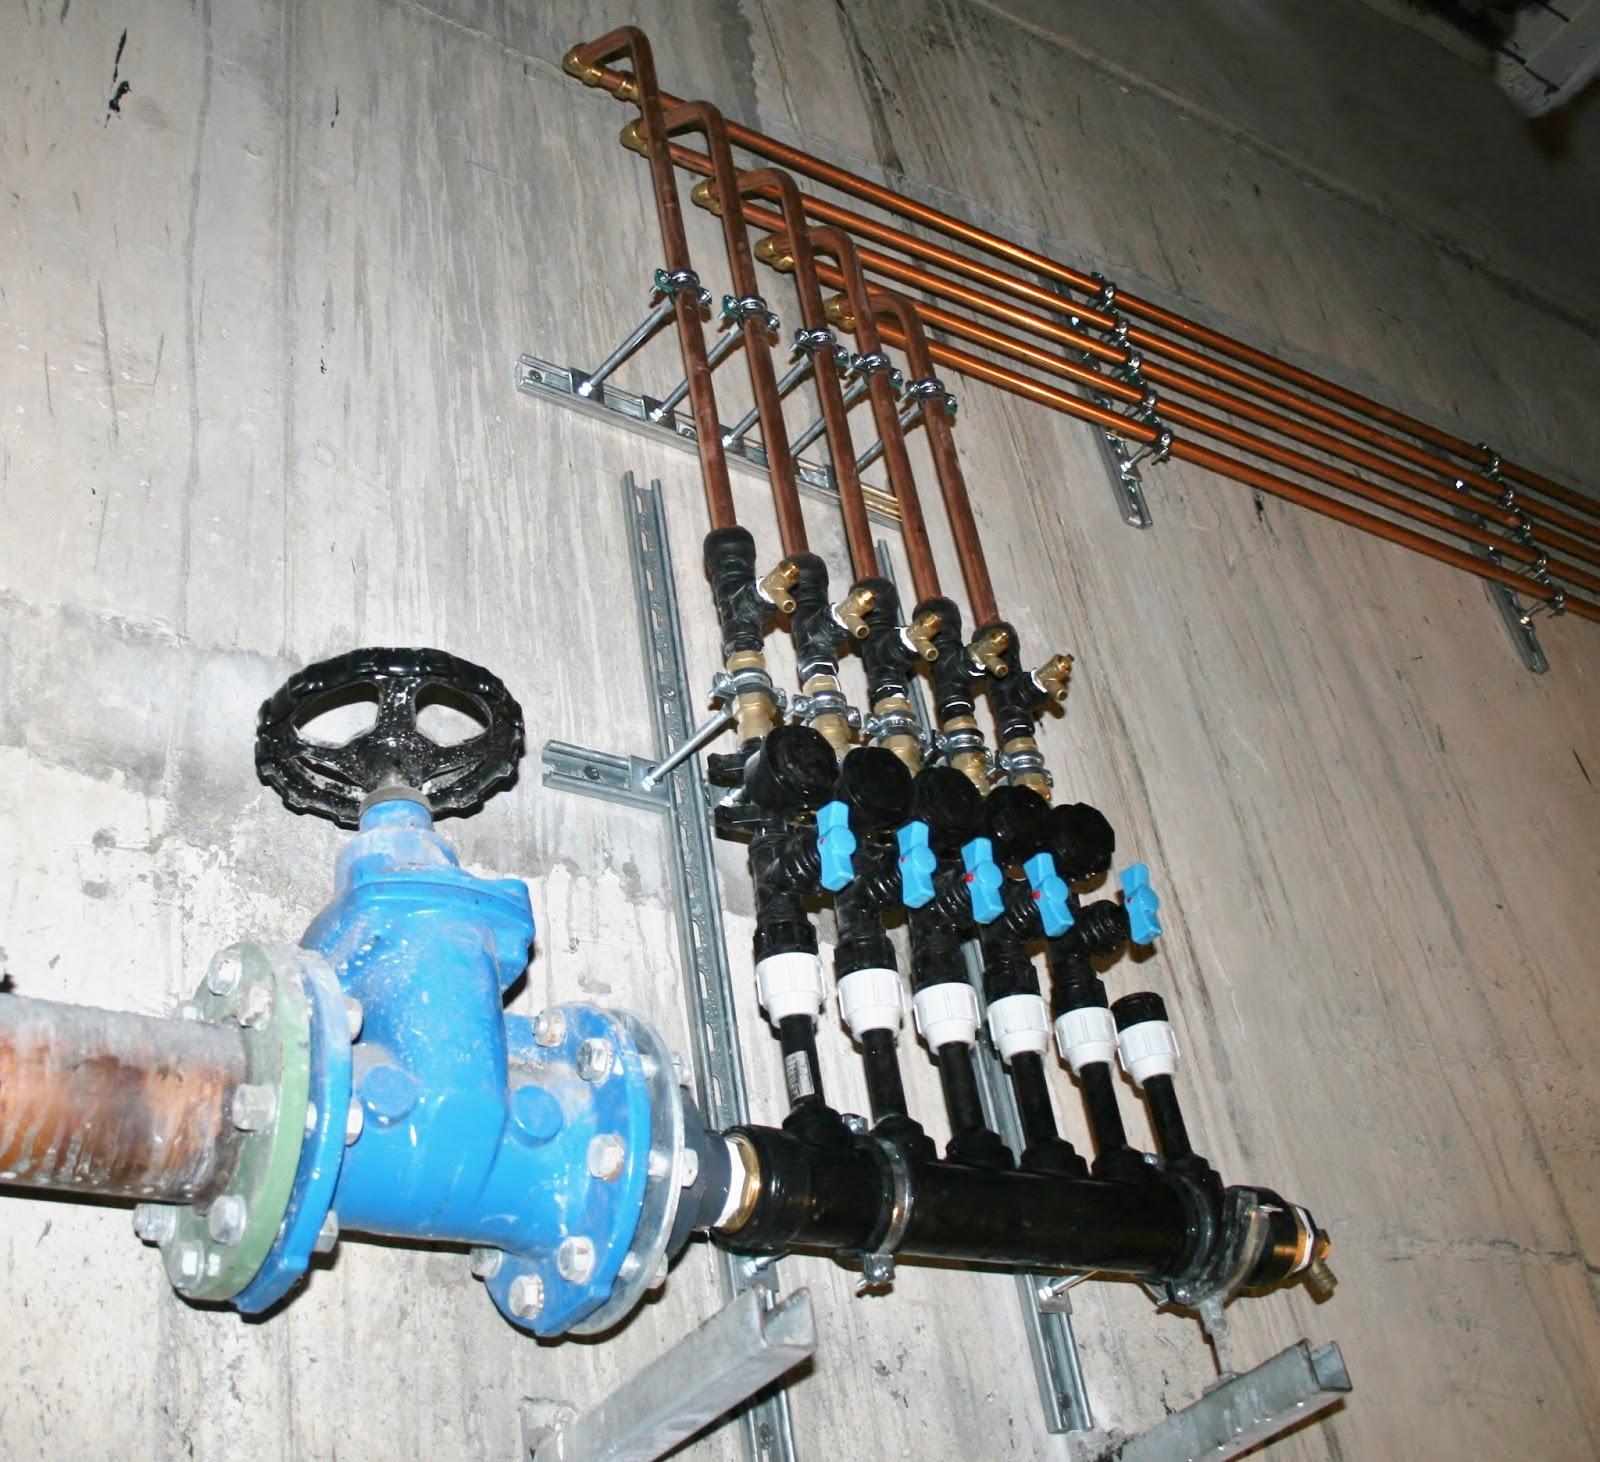 Plannet plumbing services ltd commercial building water